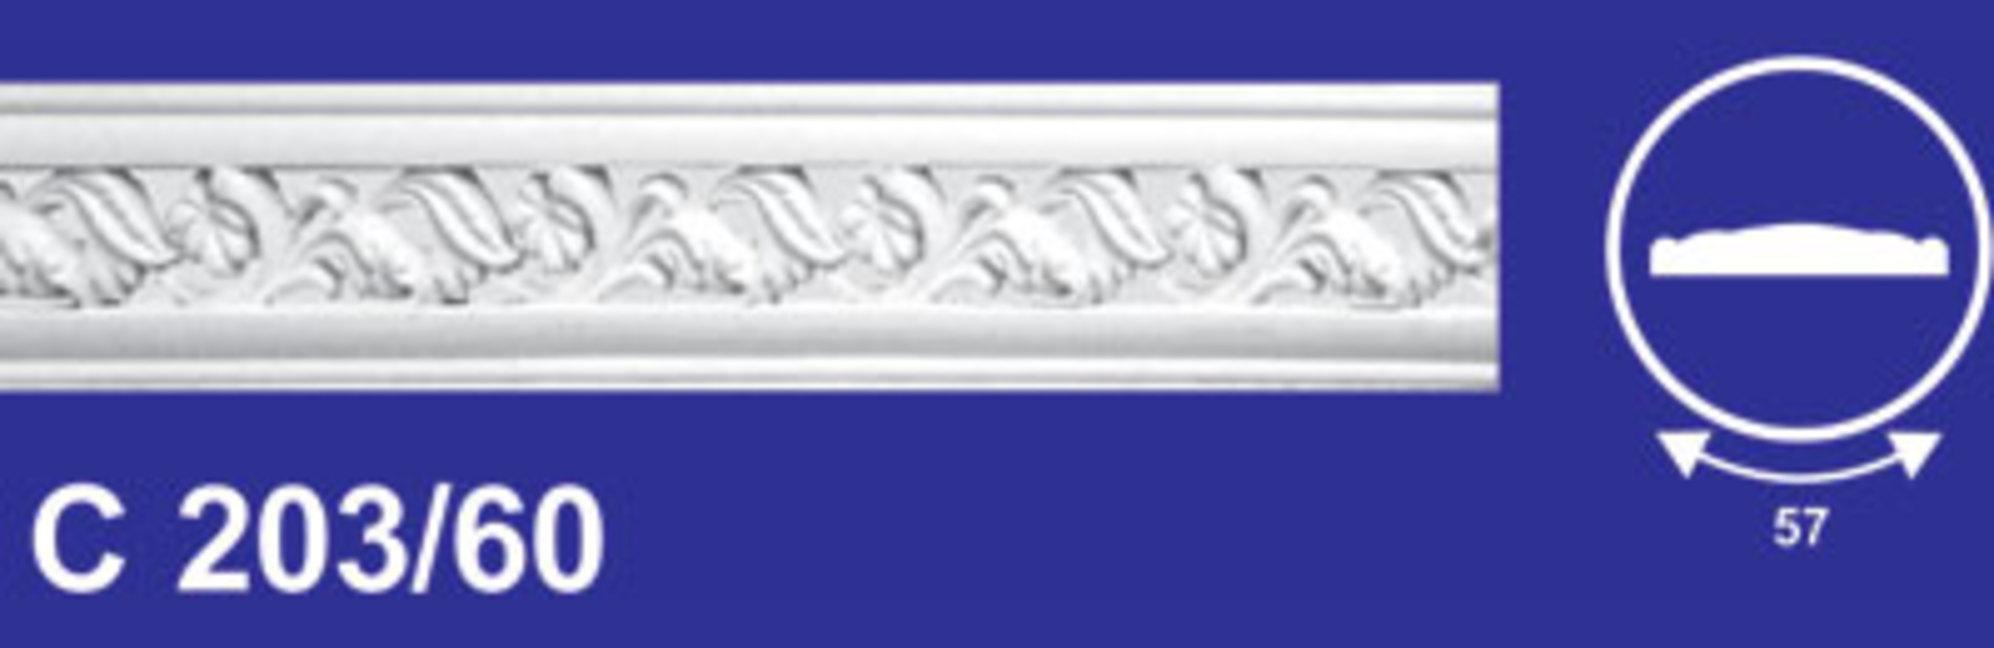 203/60  /57*2000 /Плинтус потолочный 1/70 Wikibau